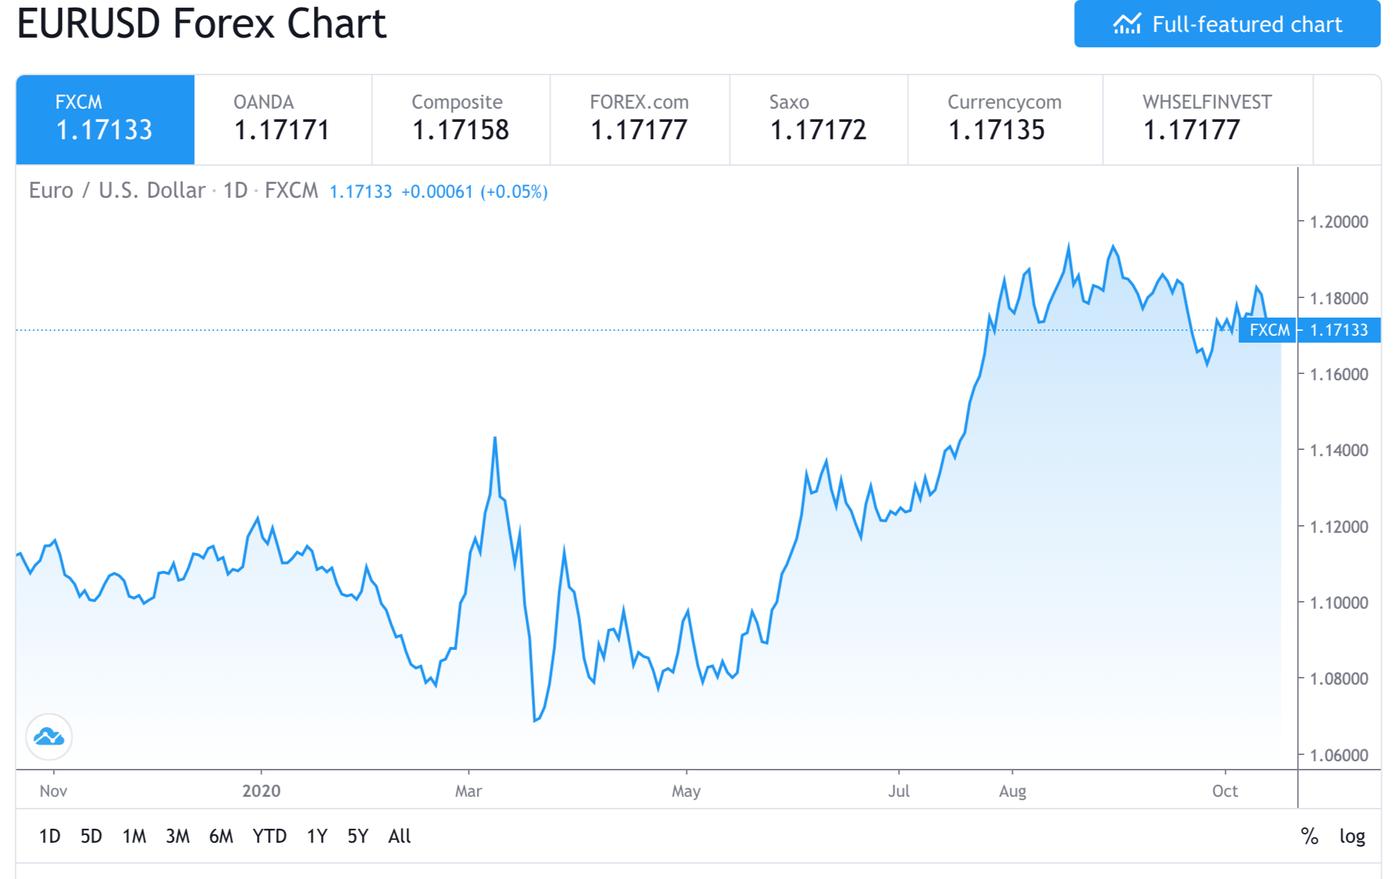 Trading view EURUSD forex price